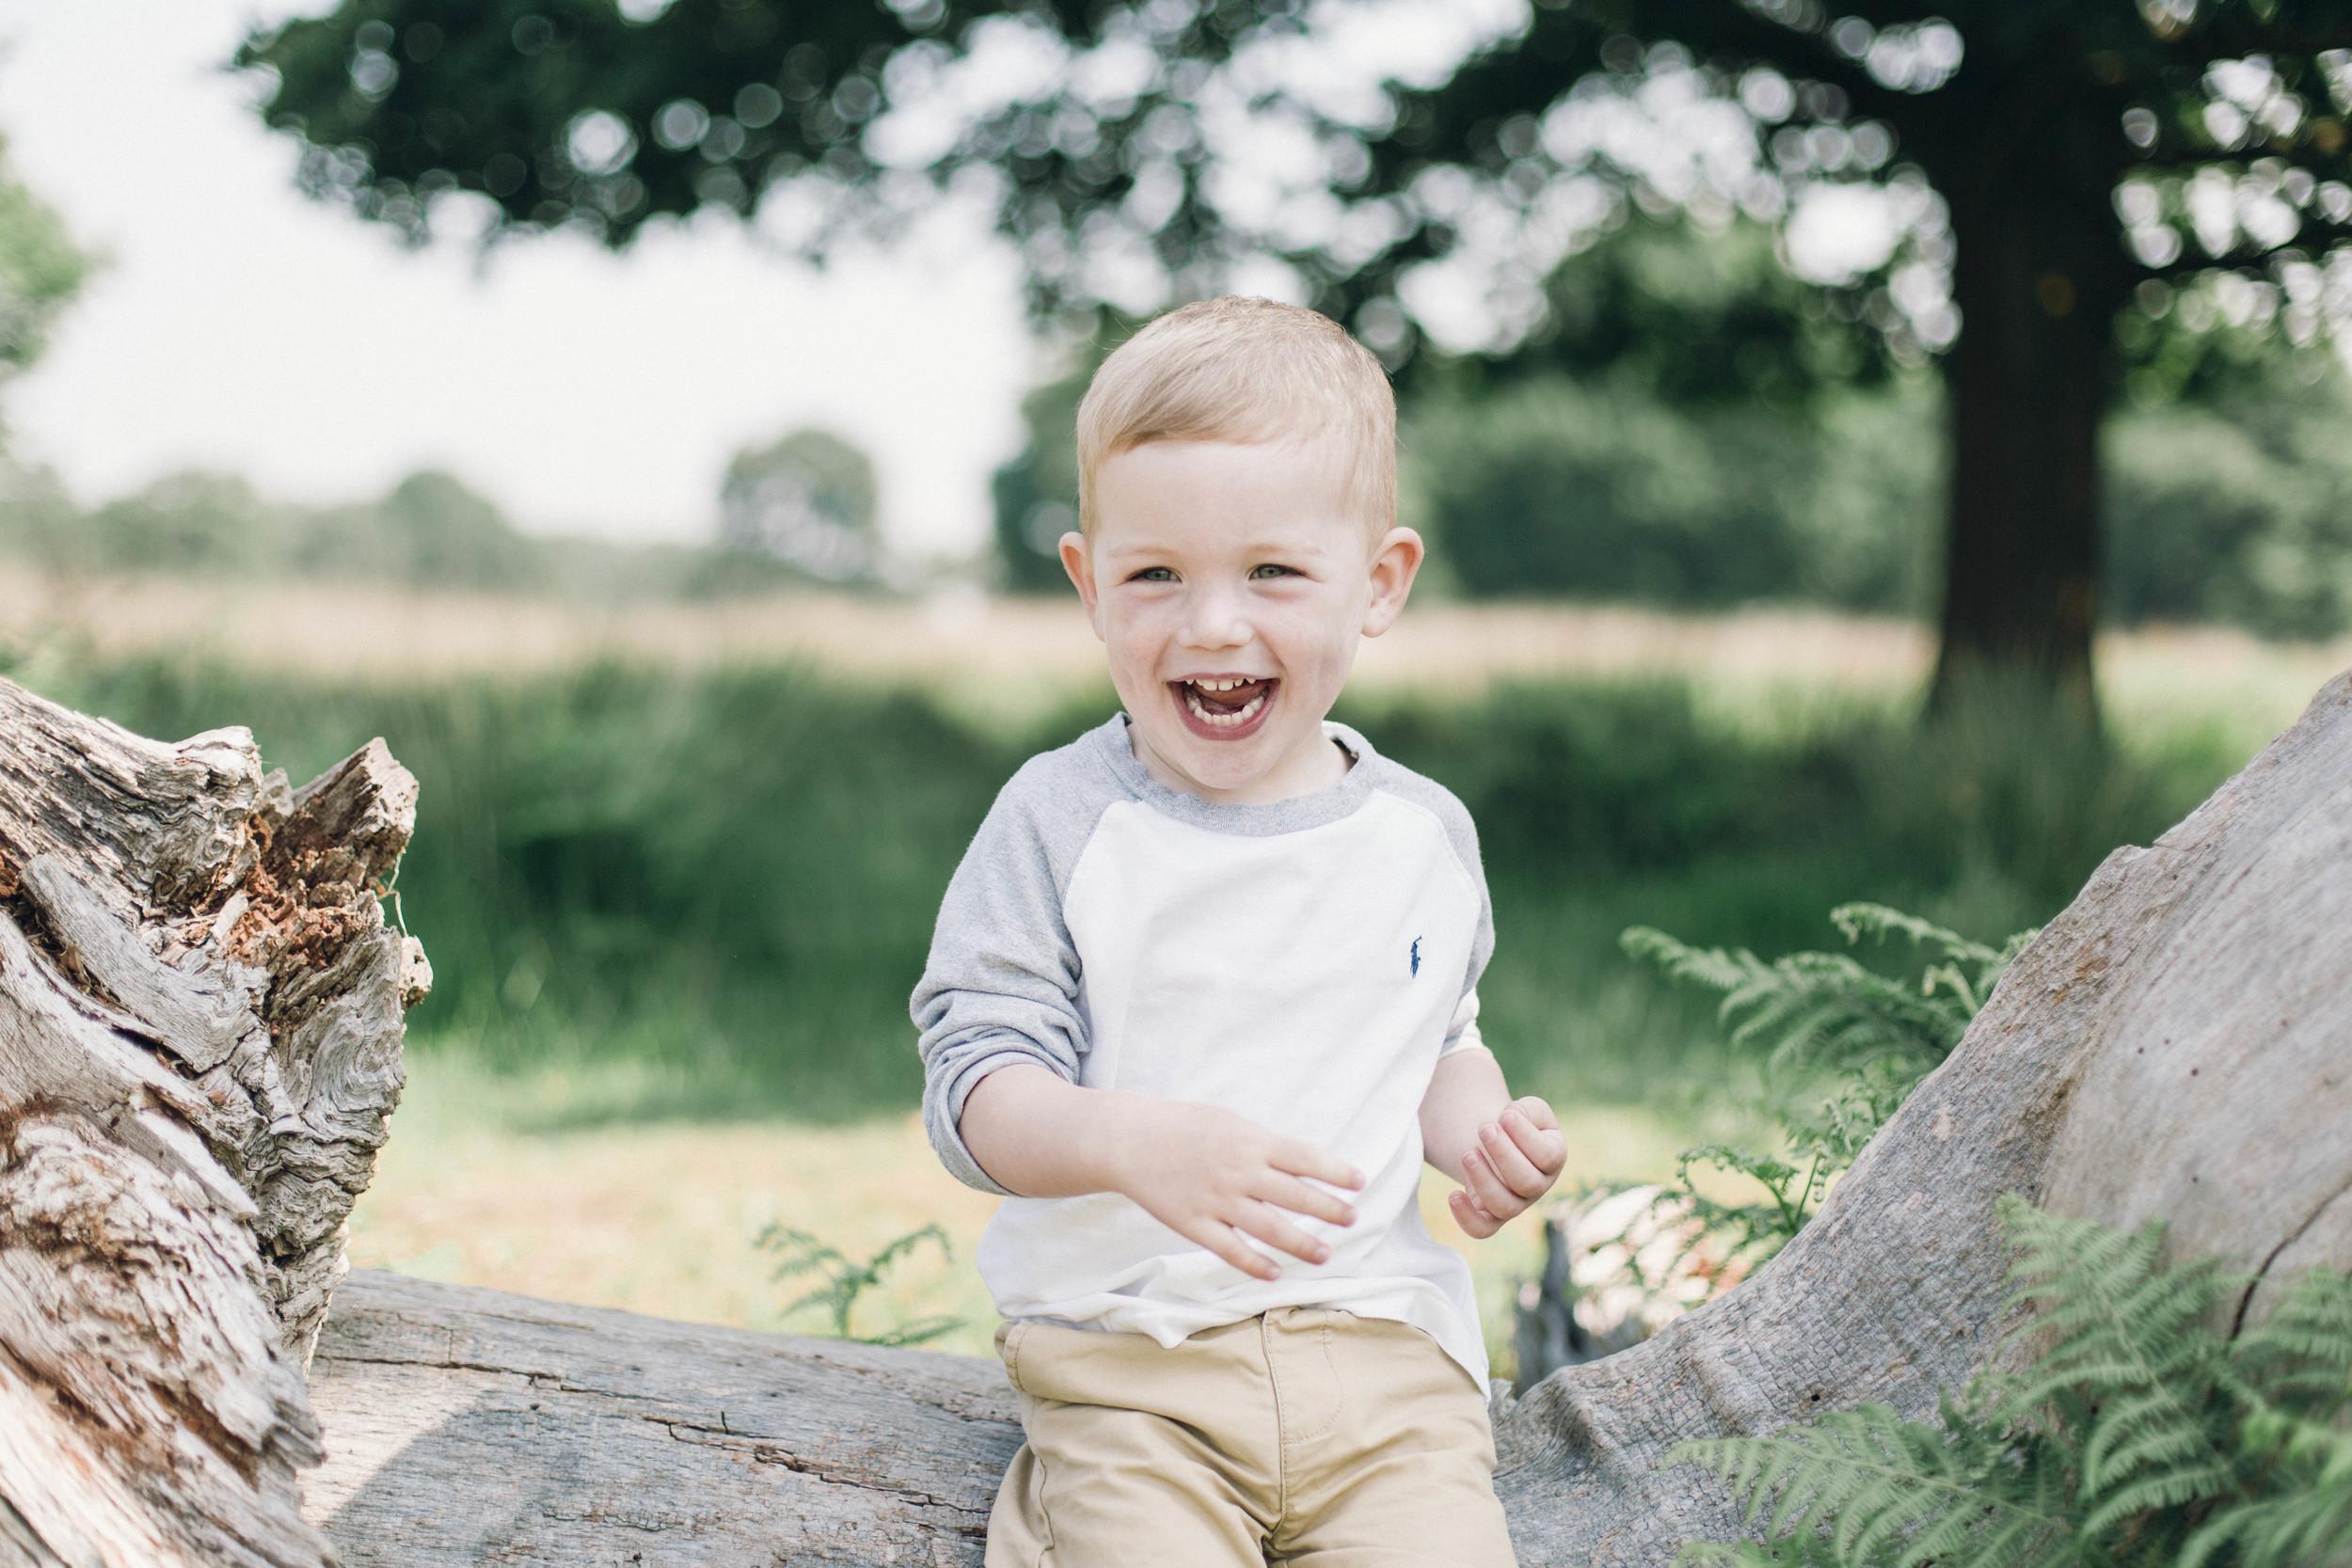 Lelya_LittleKinPhotography_family_photoshoot_Richmond-68.jpg